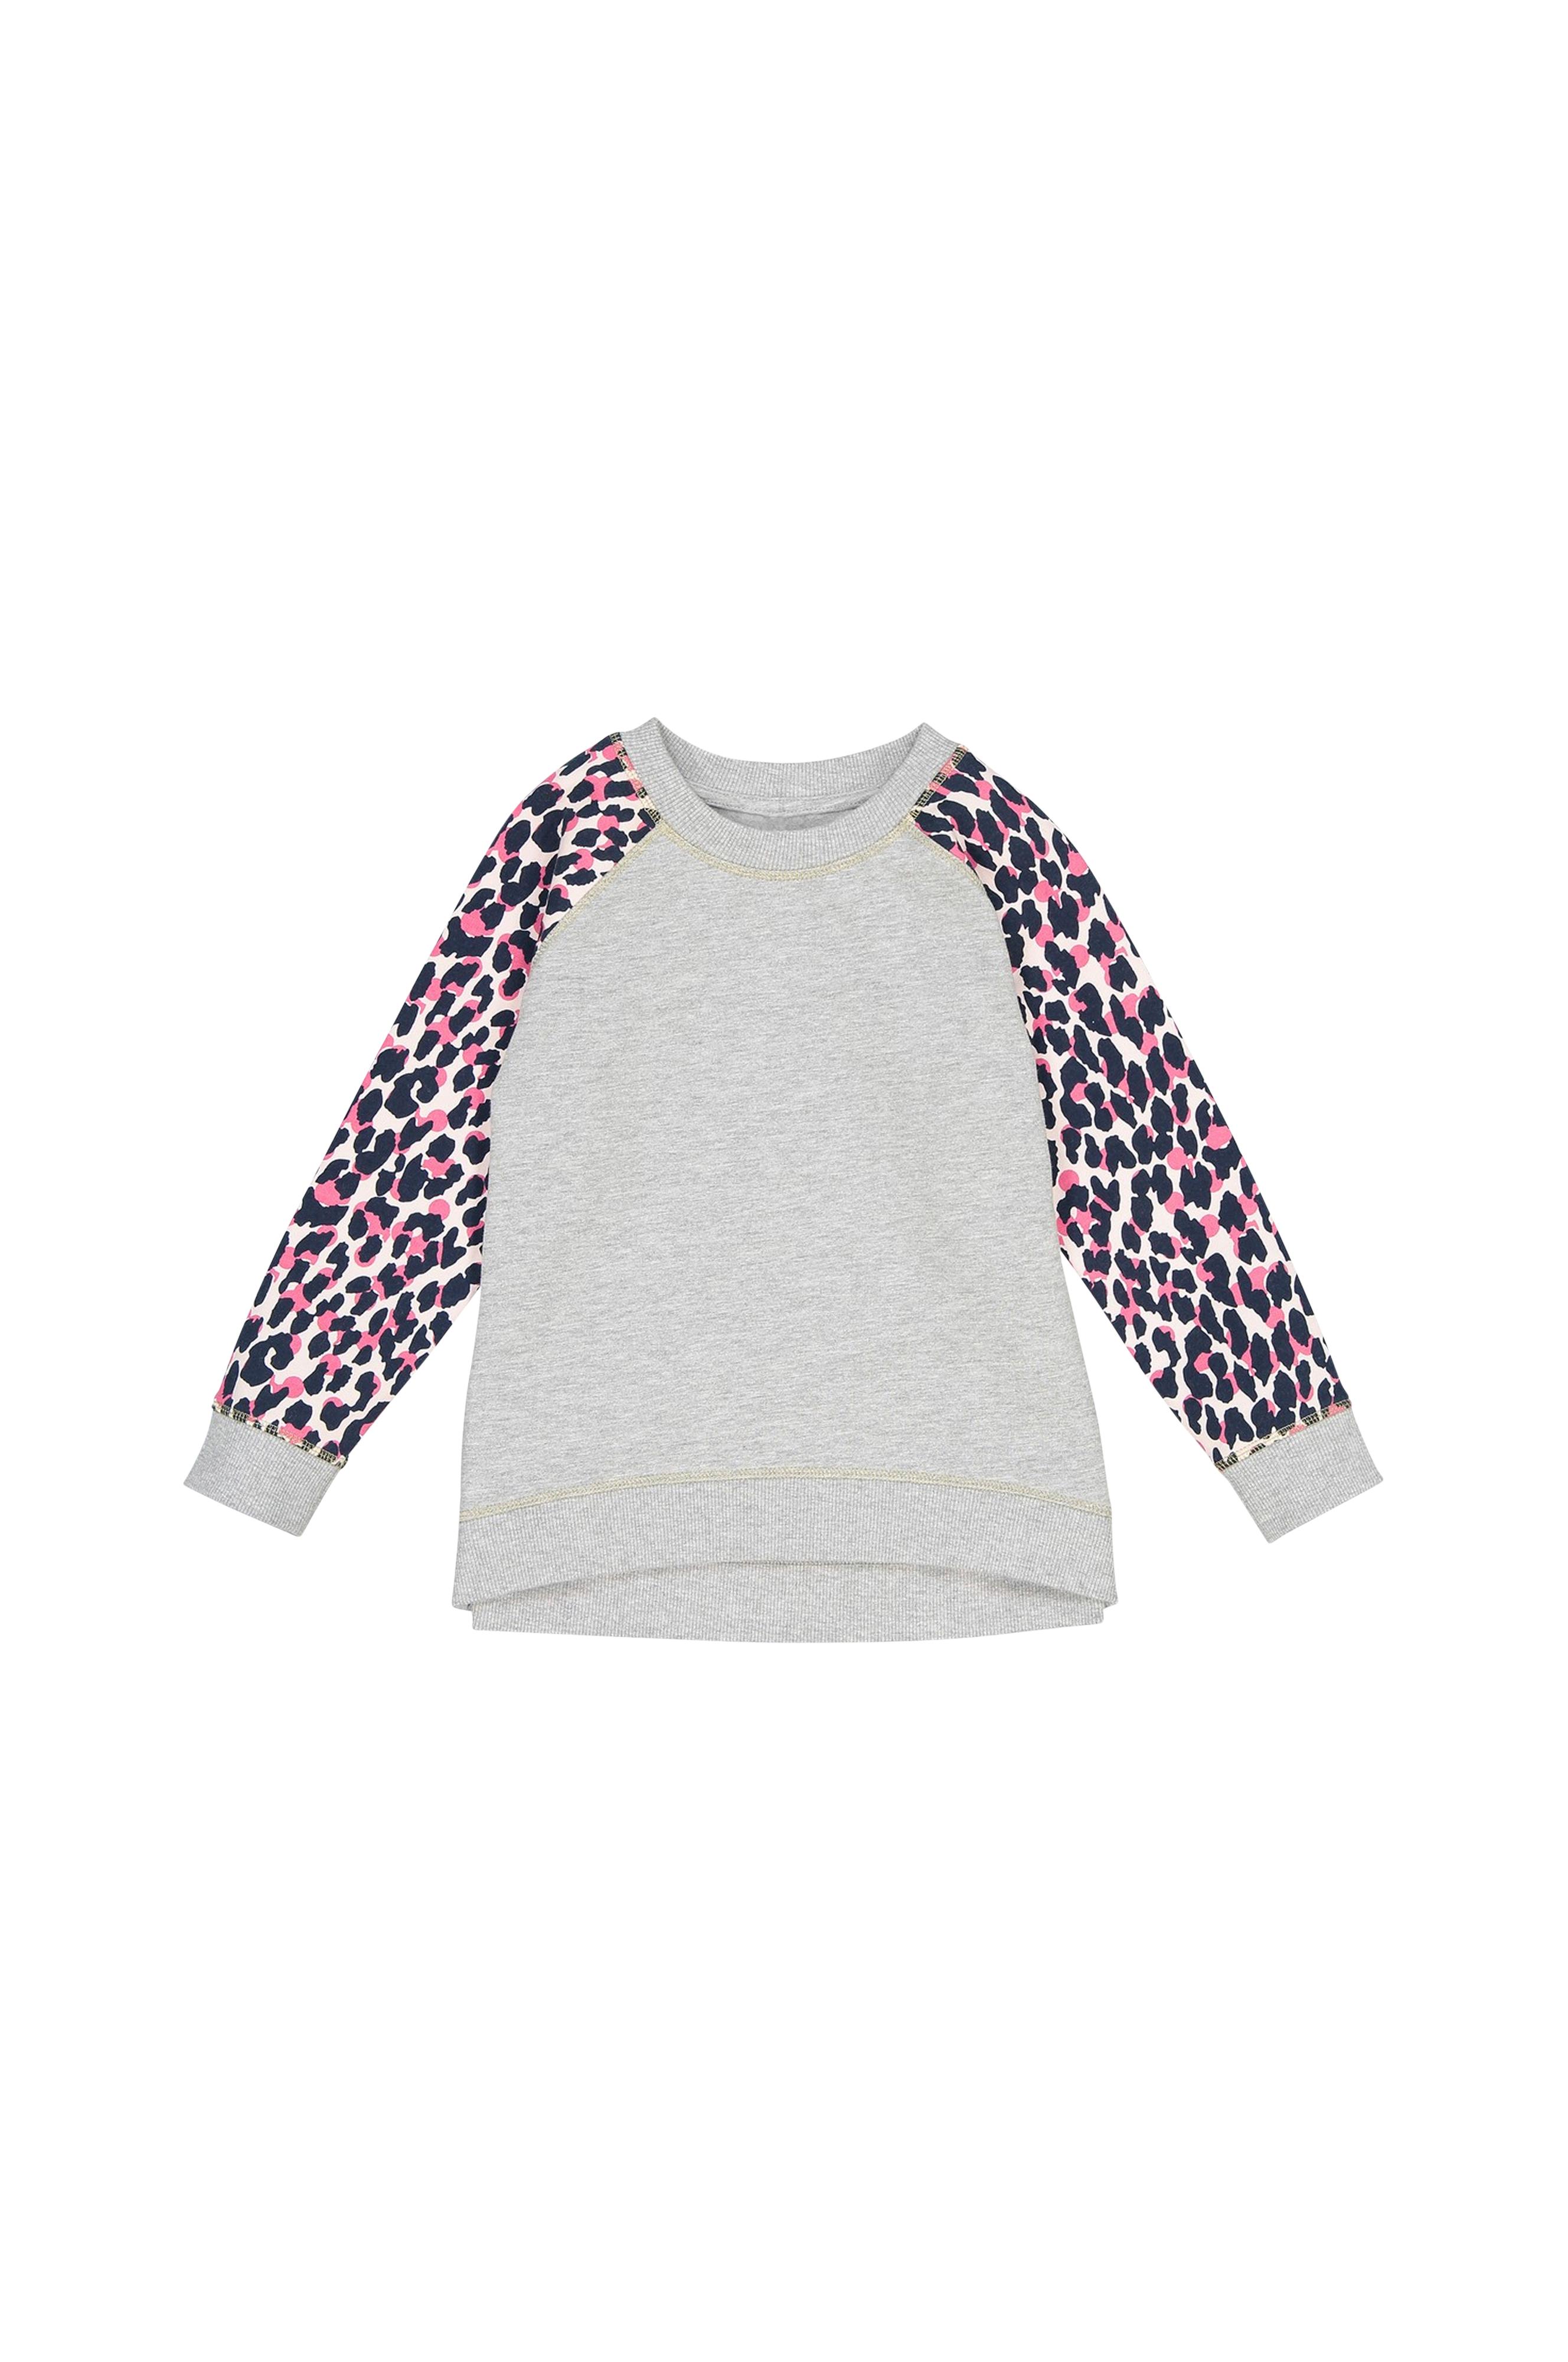 La Redoute Sweatshirt Med Mønstret Raglanærme Grå Børn Ellosdk